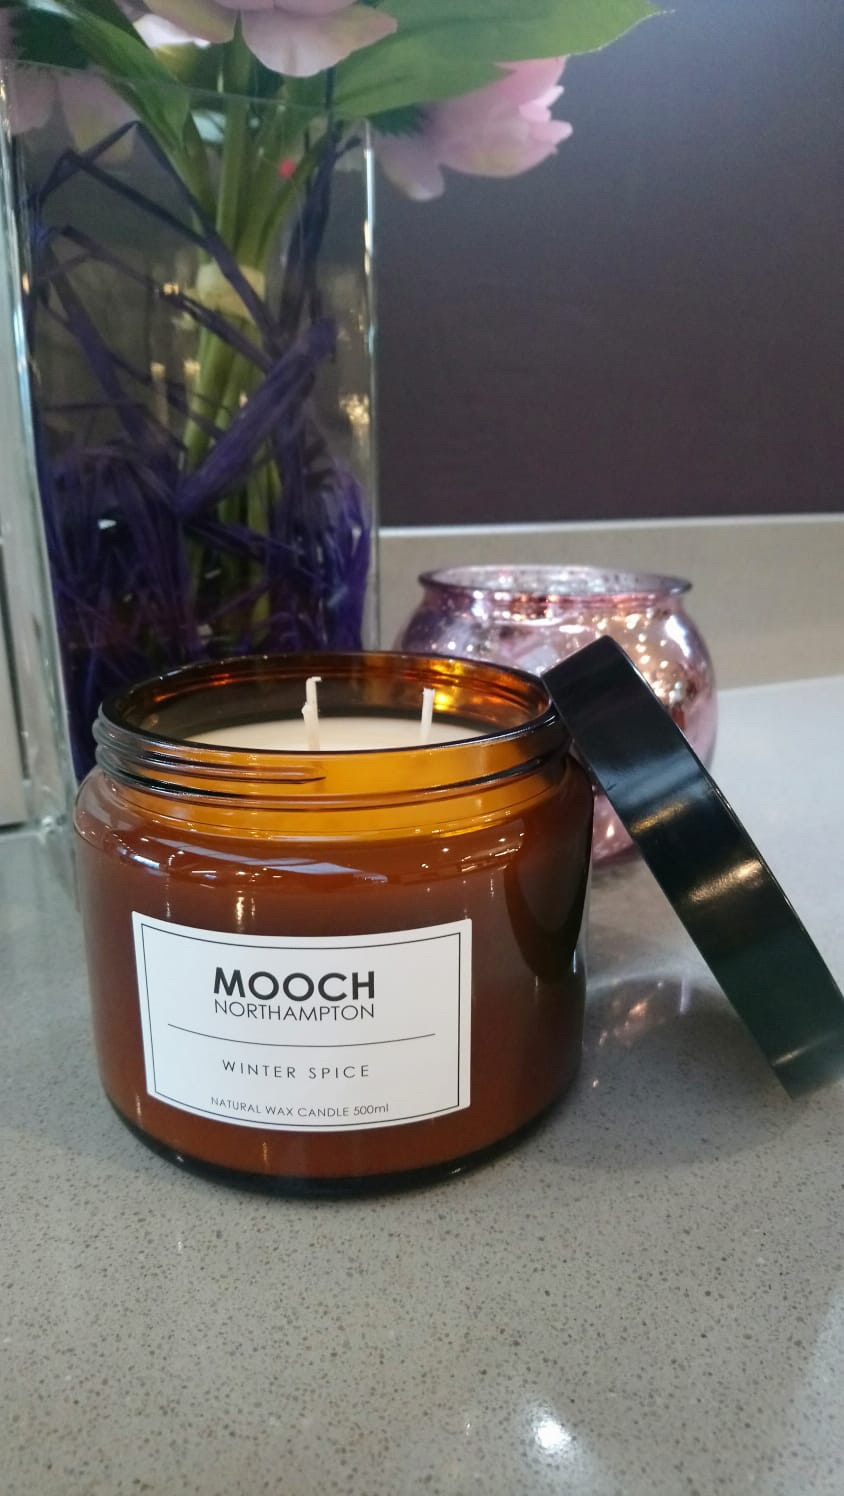 MOOCH 3-WICK CANDLE - WINTER SPICE